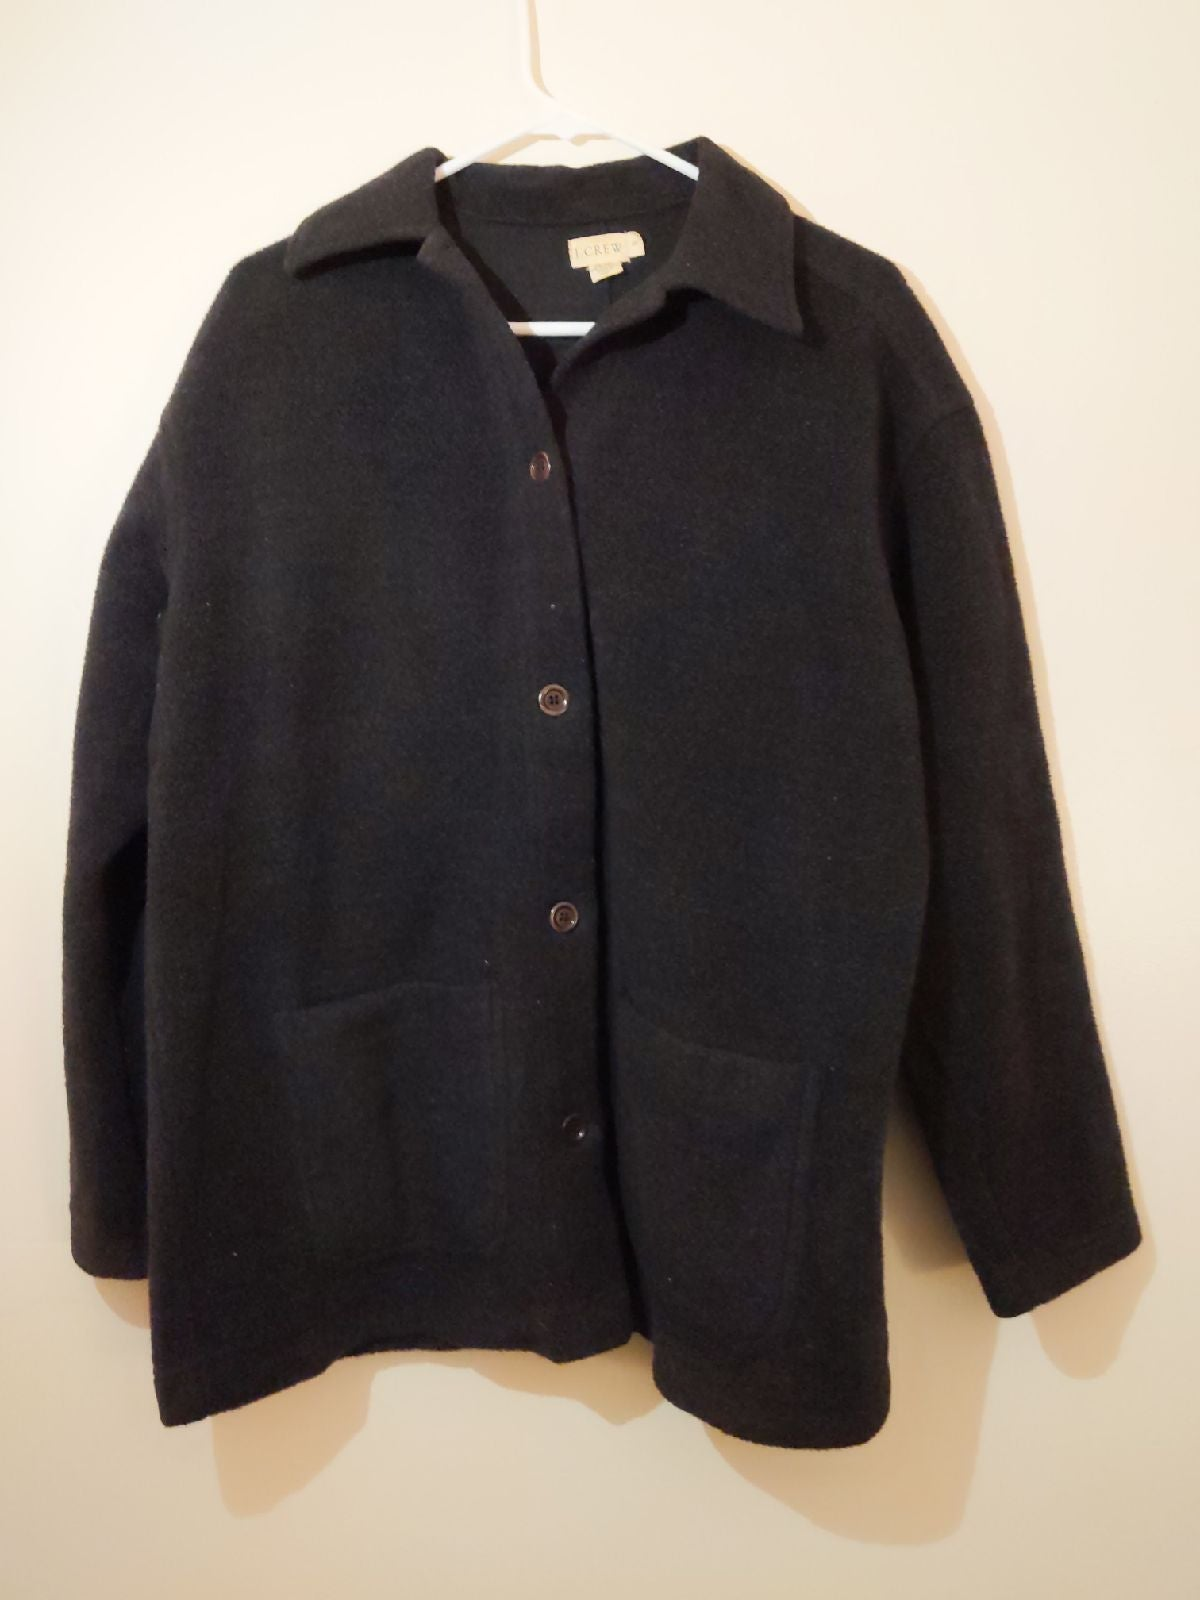 Vintage J Crew jacket